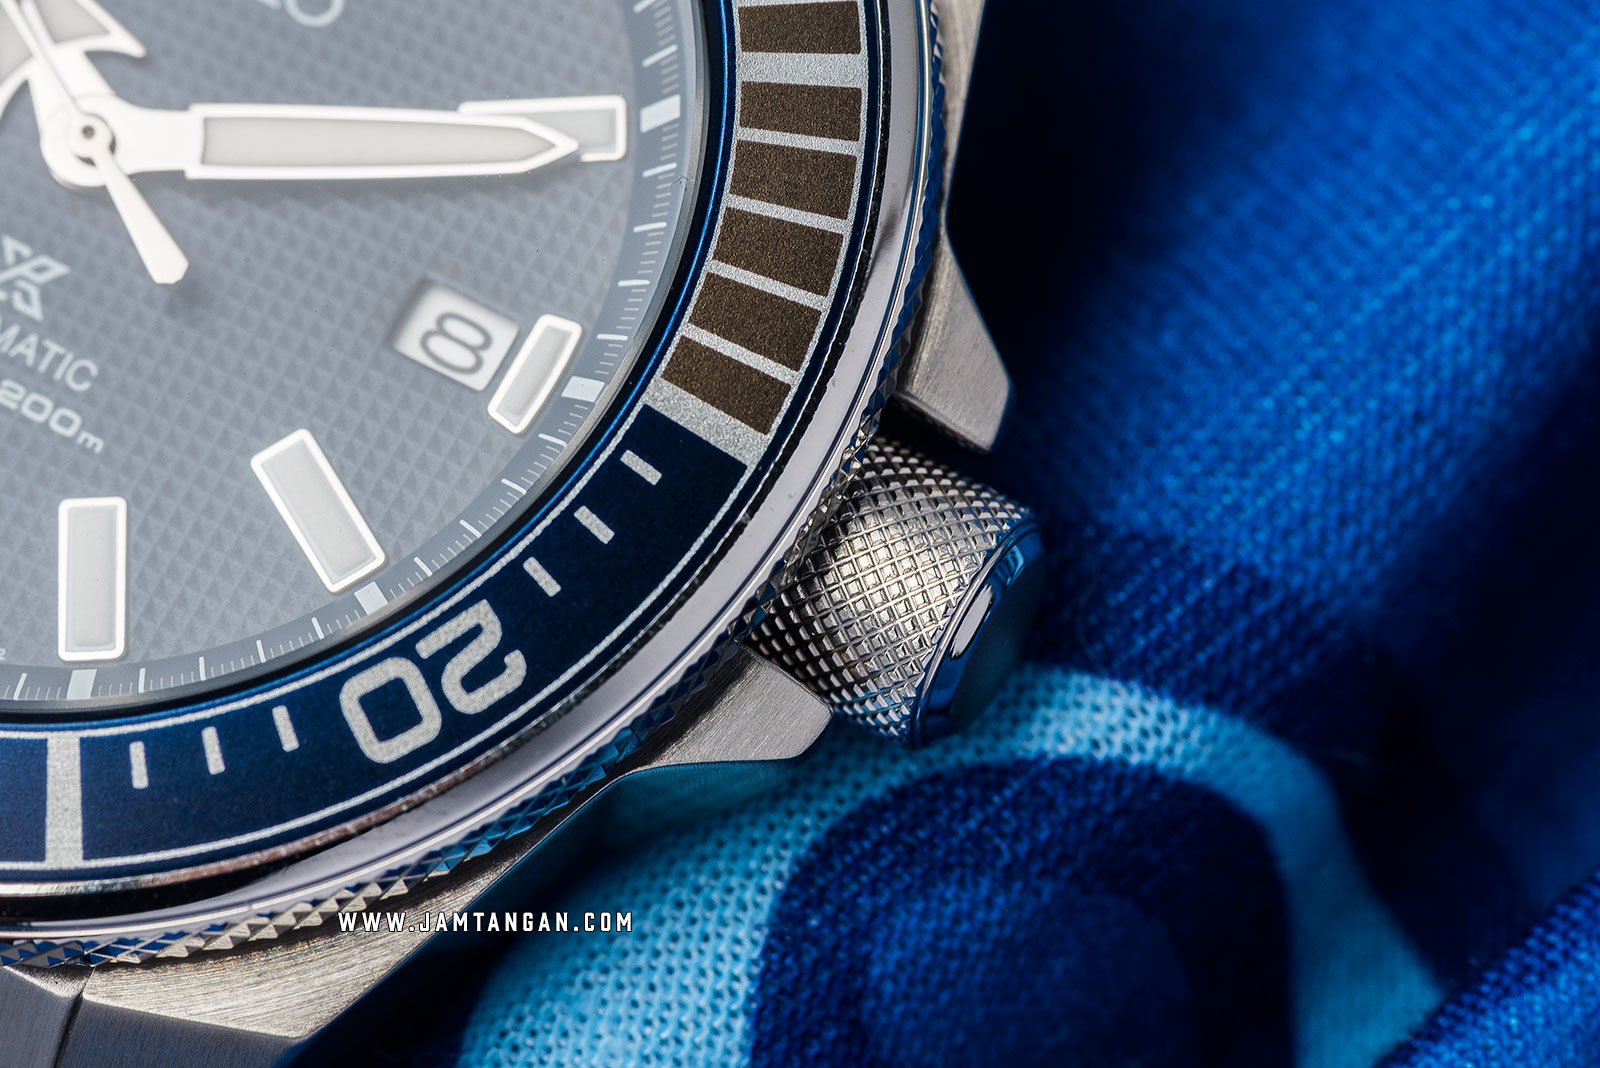 Seiko Prospex Samurai SRPB49K1 Automatic Divers Blue Texture Dial Stainless Steel Strap Machtwatch